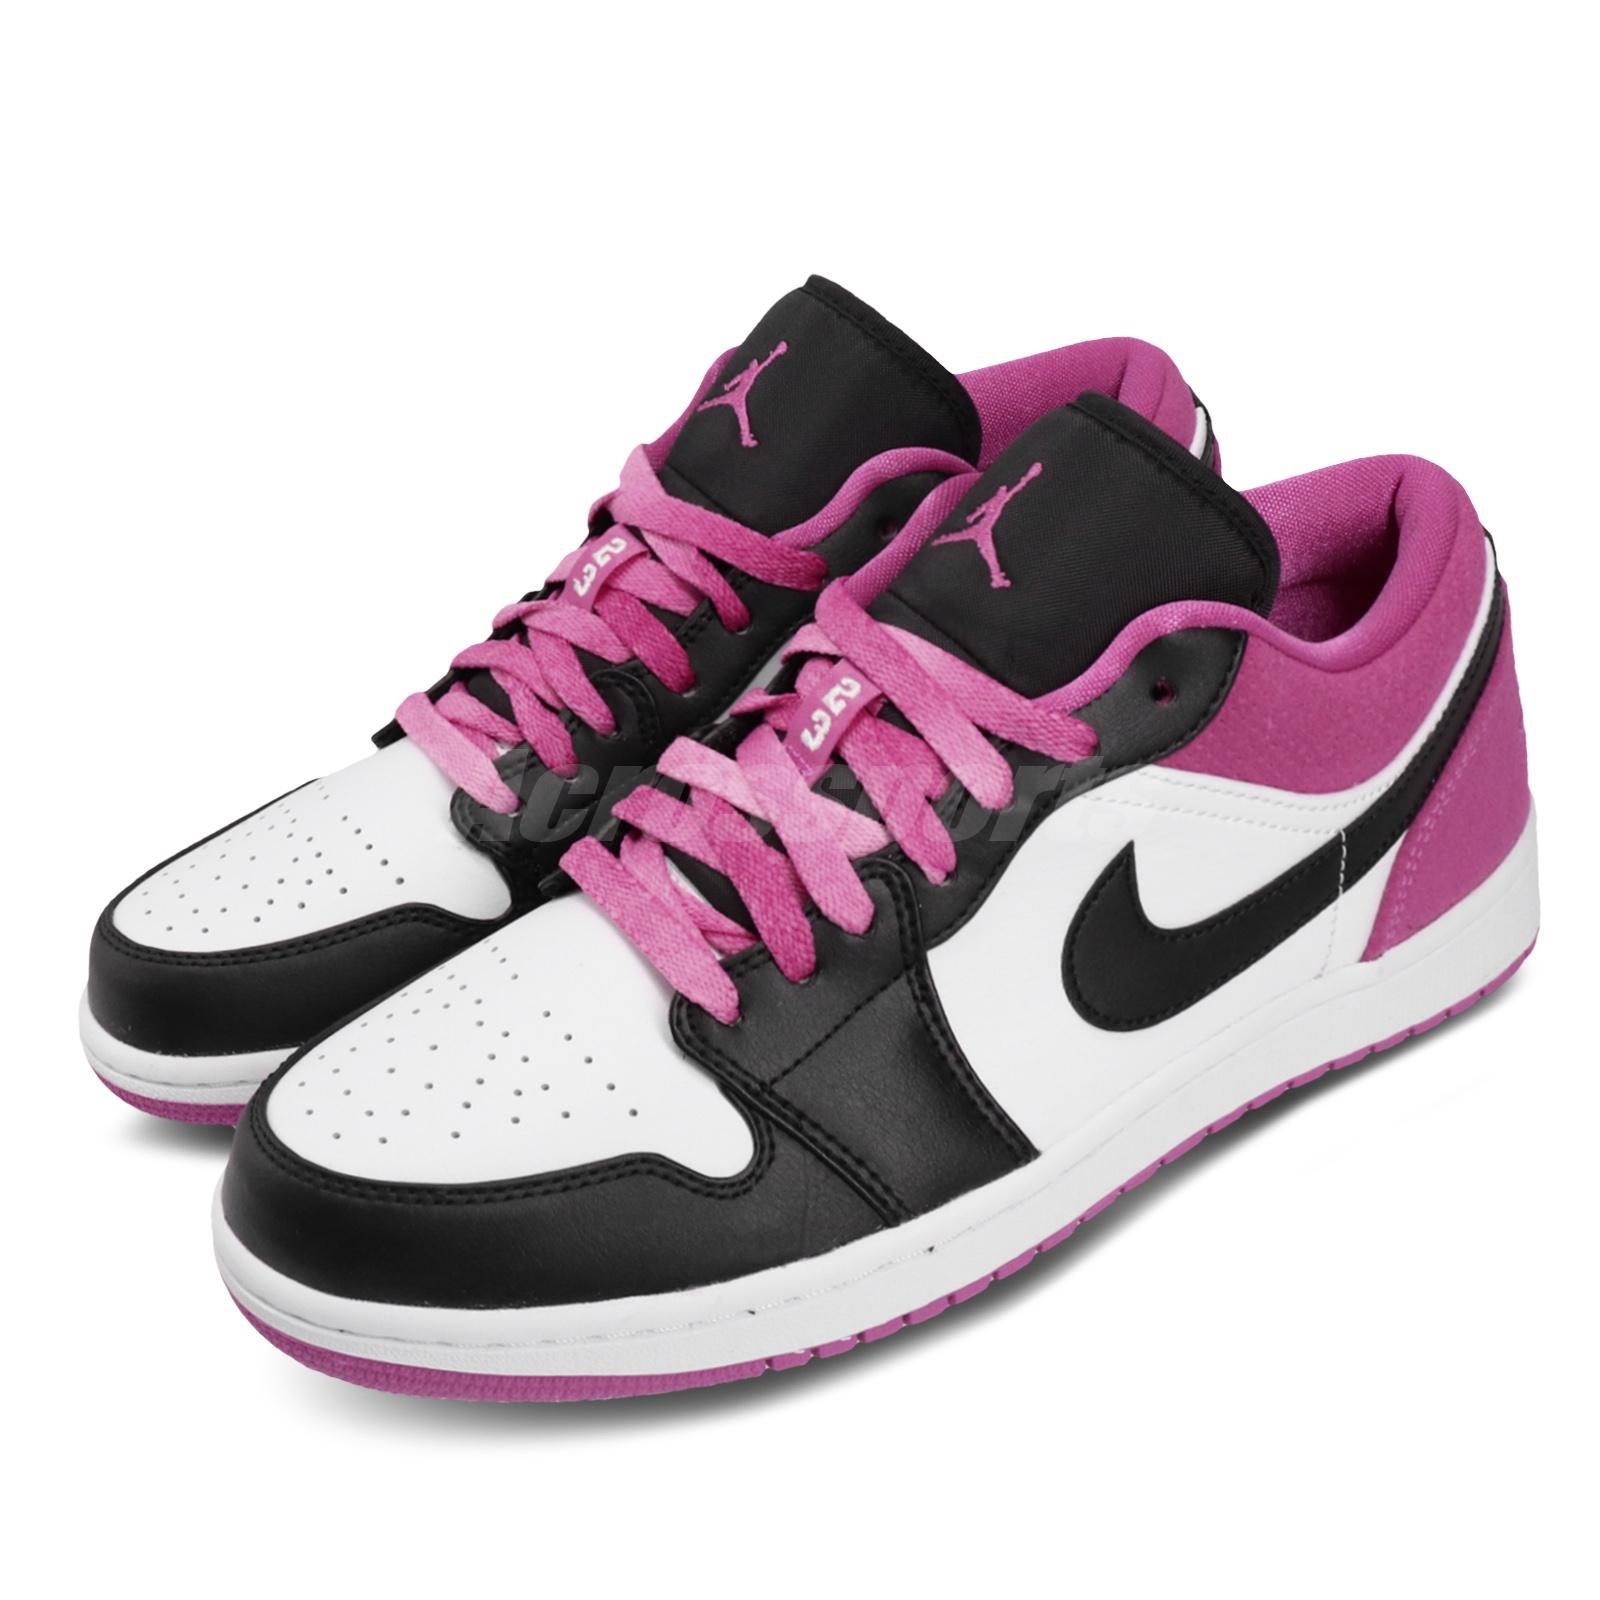 Nike Air Jordan 1 Low Se I Aj1 Fuchsia Black White Magenta Men